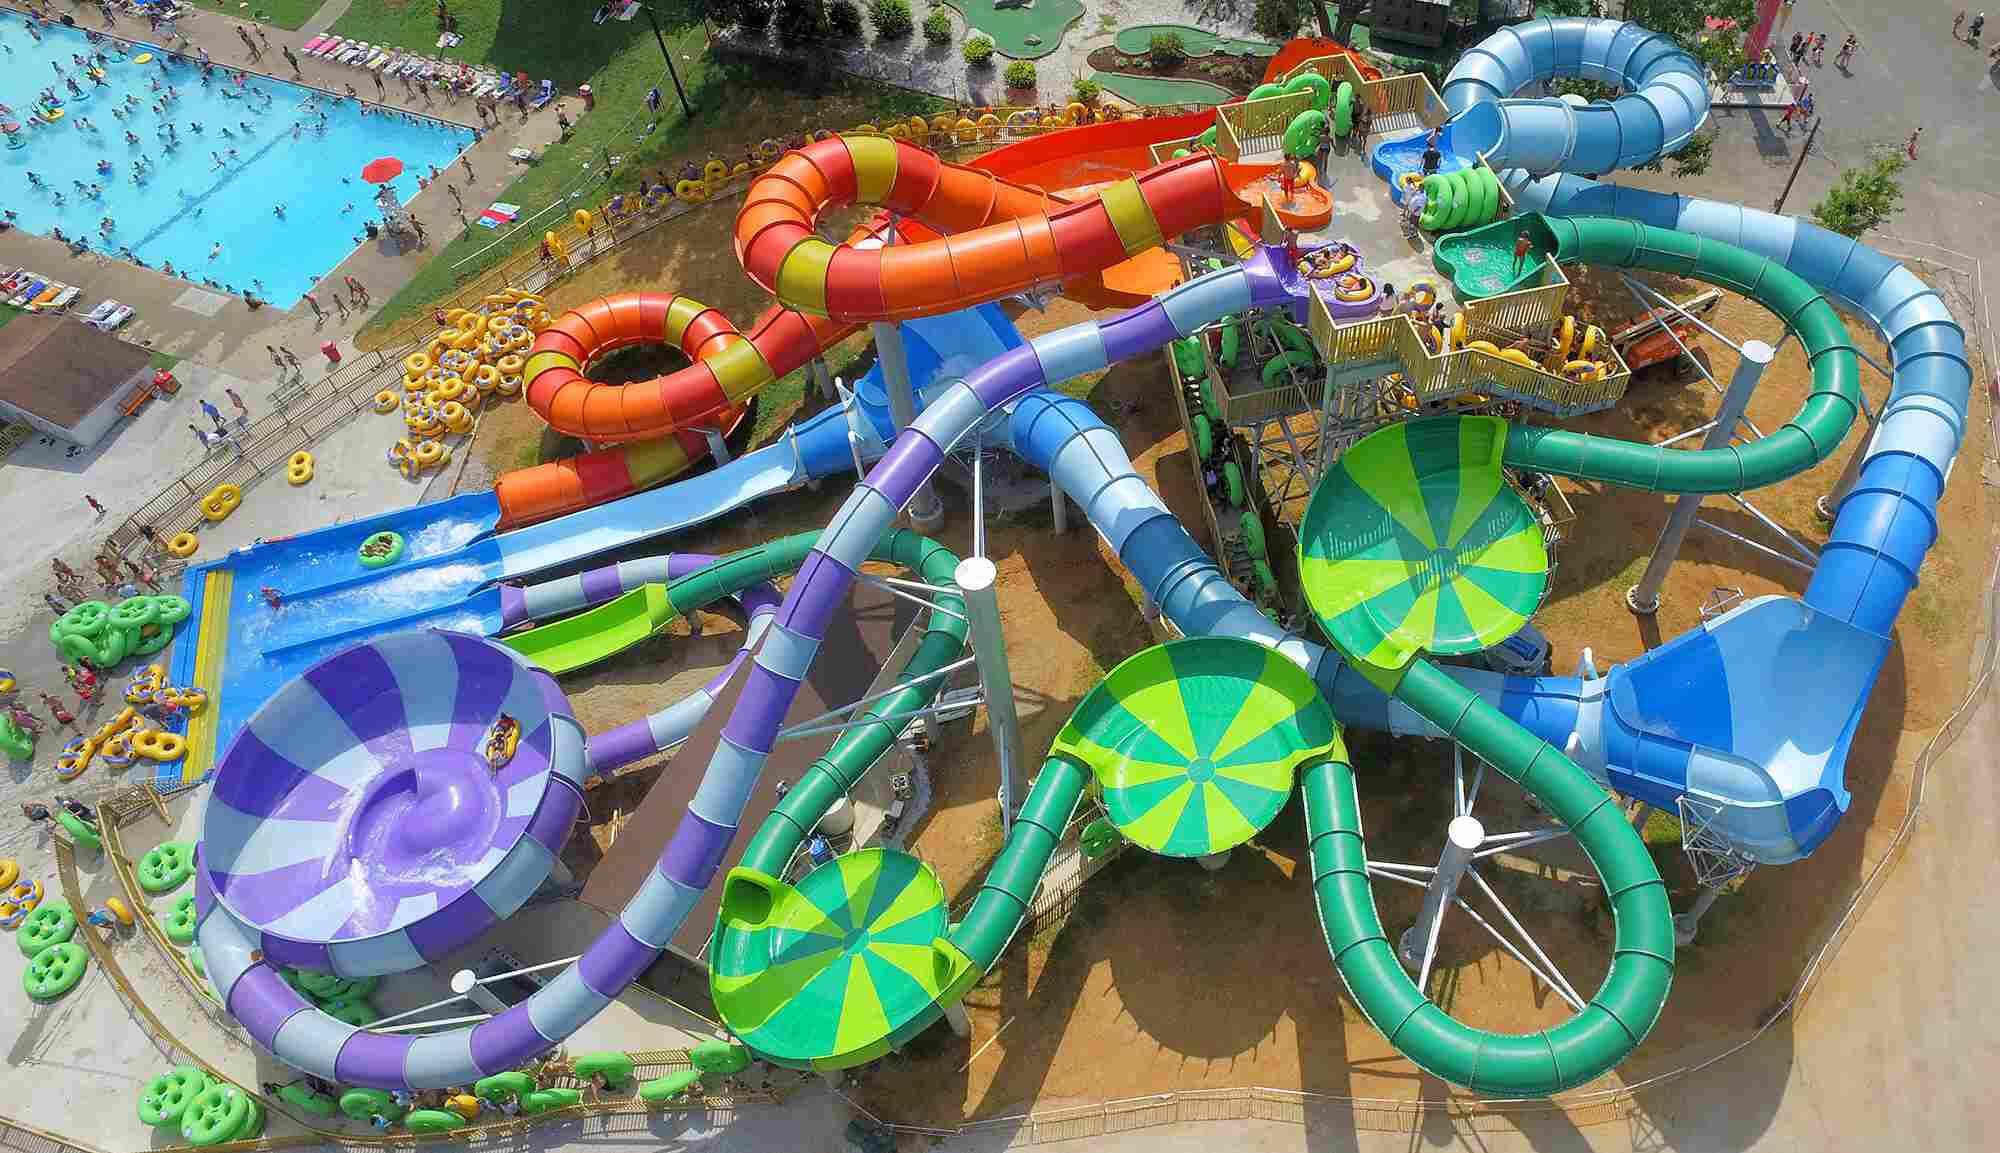 9 Amusement and Theme Parks Near Nashville